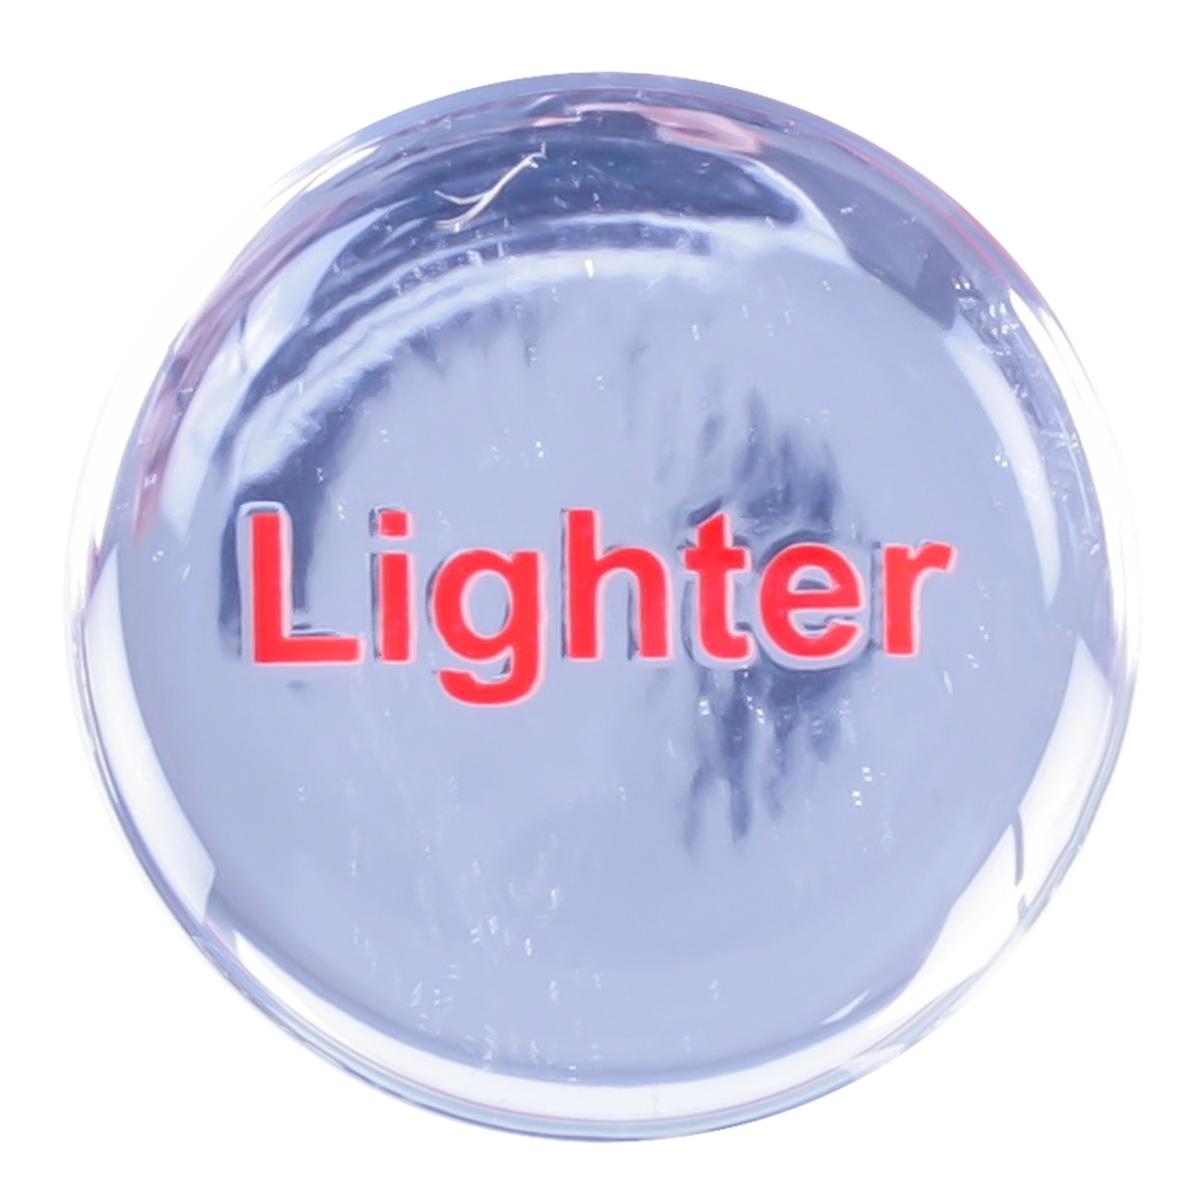 96656 Silver Sticker for Cigarette Lighter